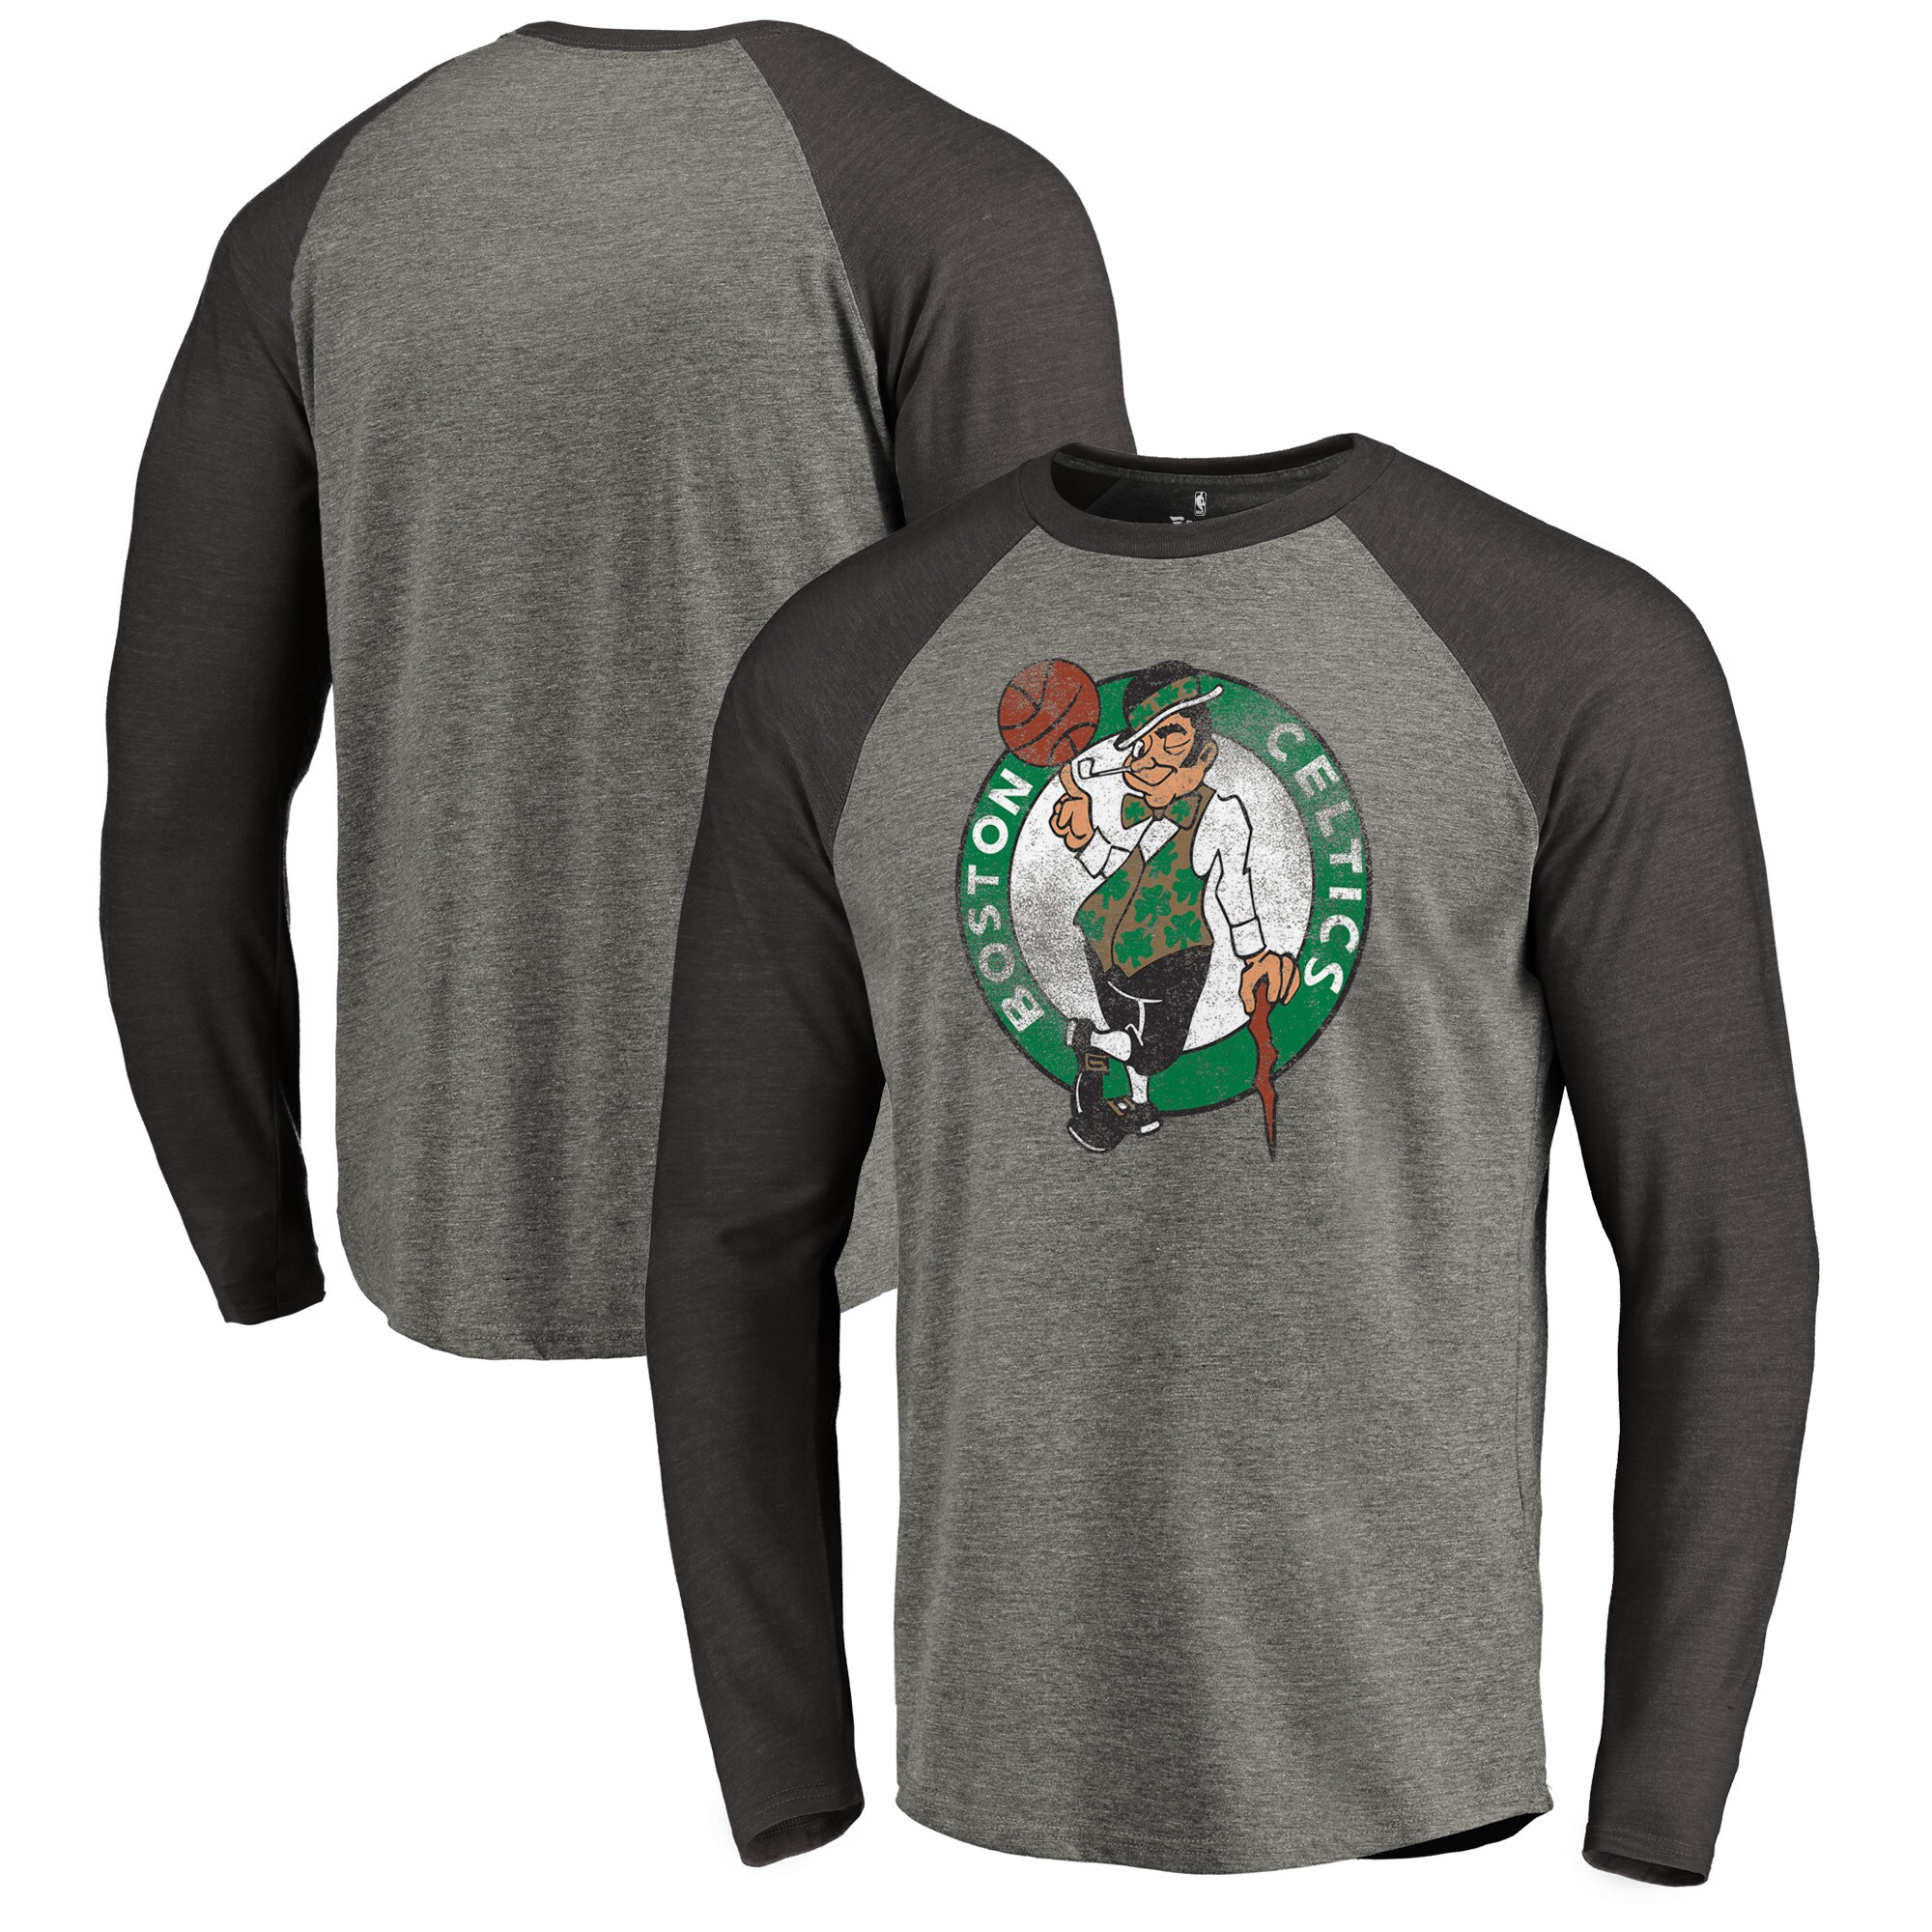 Boston Celtics Fanatics Branded Distressed Logo Tri-Blend Raglan Long Sleeve T-Shirt - Ash/Black